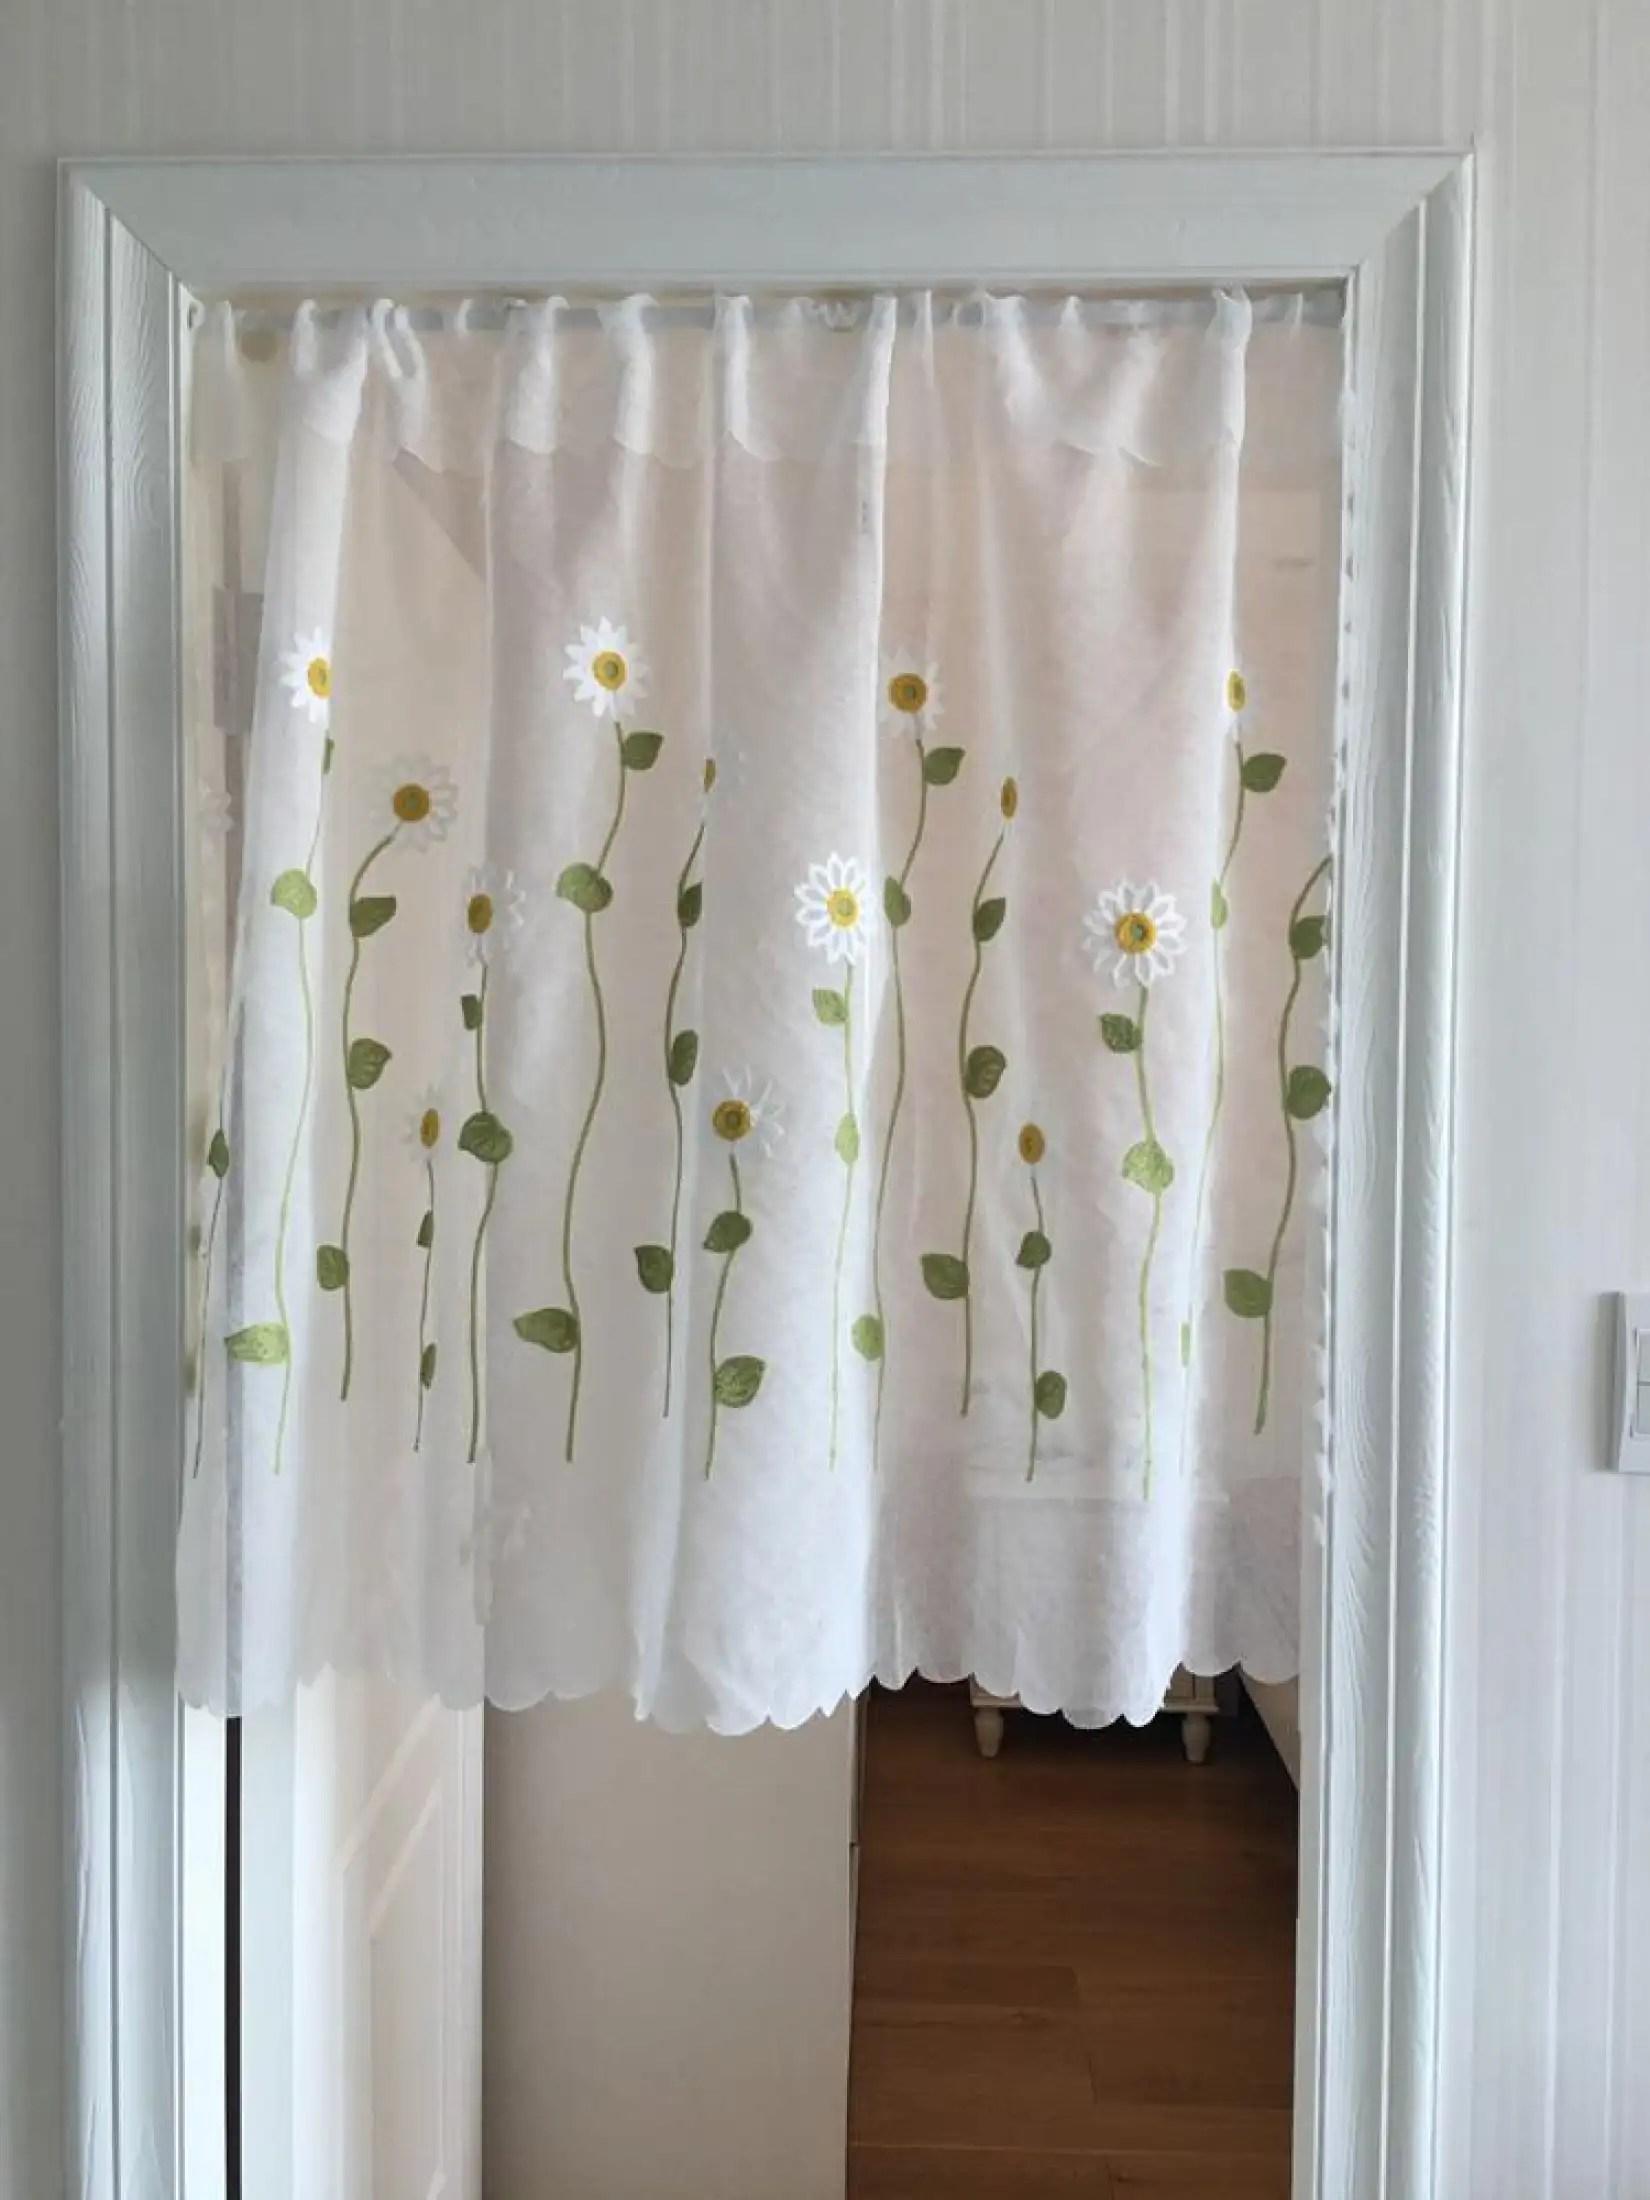 japanese style flower long lace door curtains gauze embroidery bedroom room dividers bathroom curtain decoration modern kitchen tassel pendant door